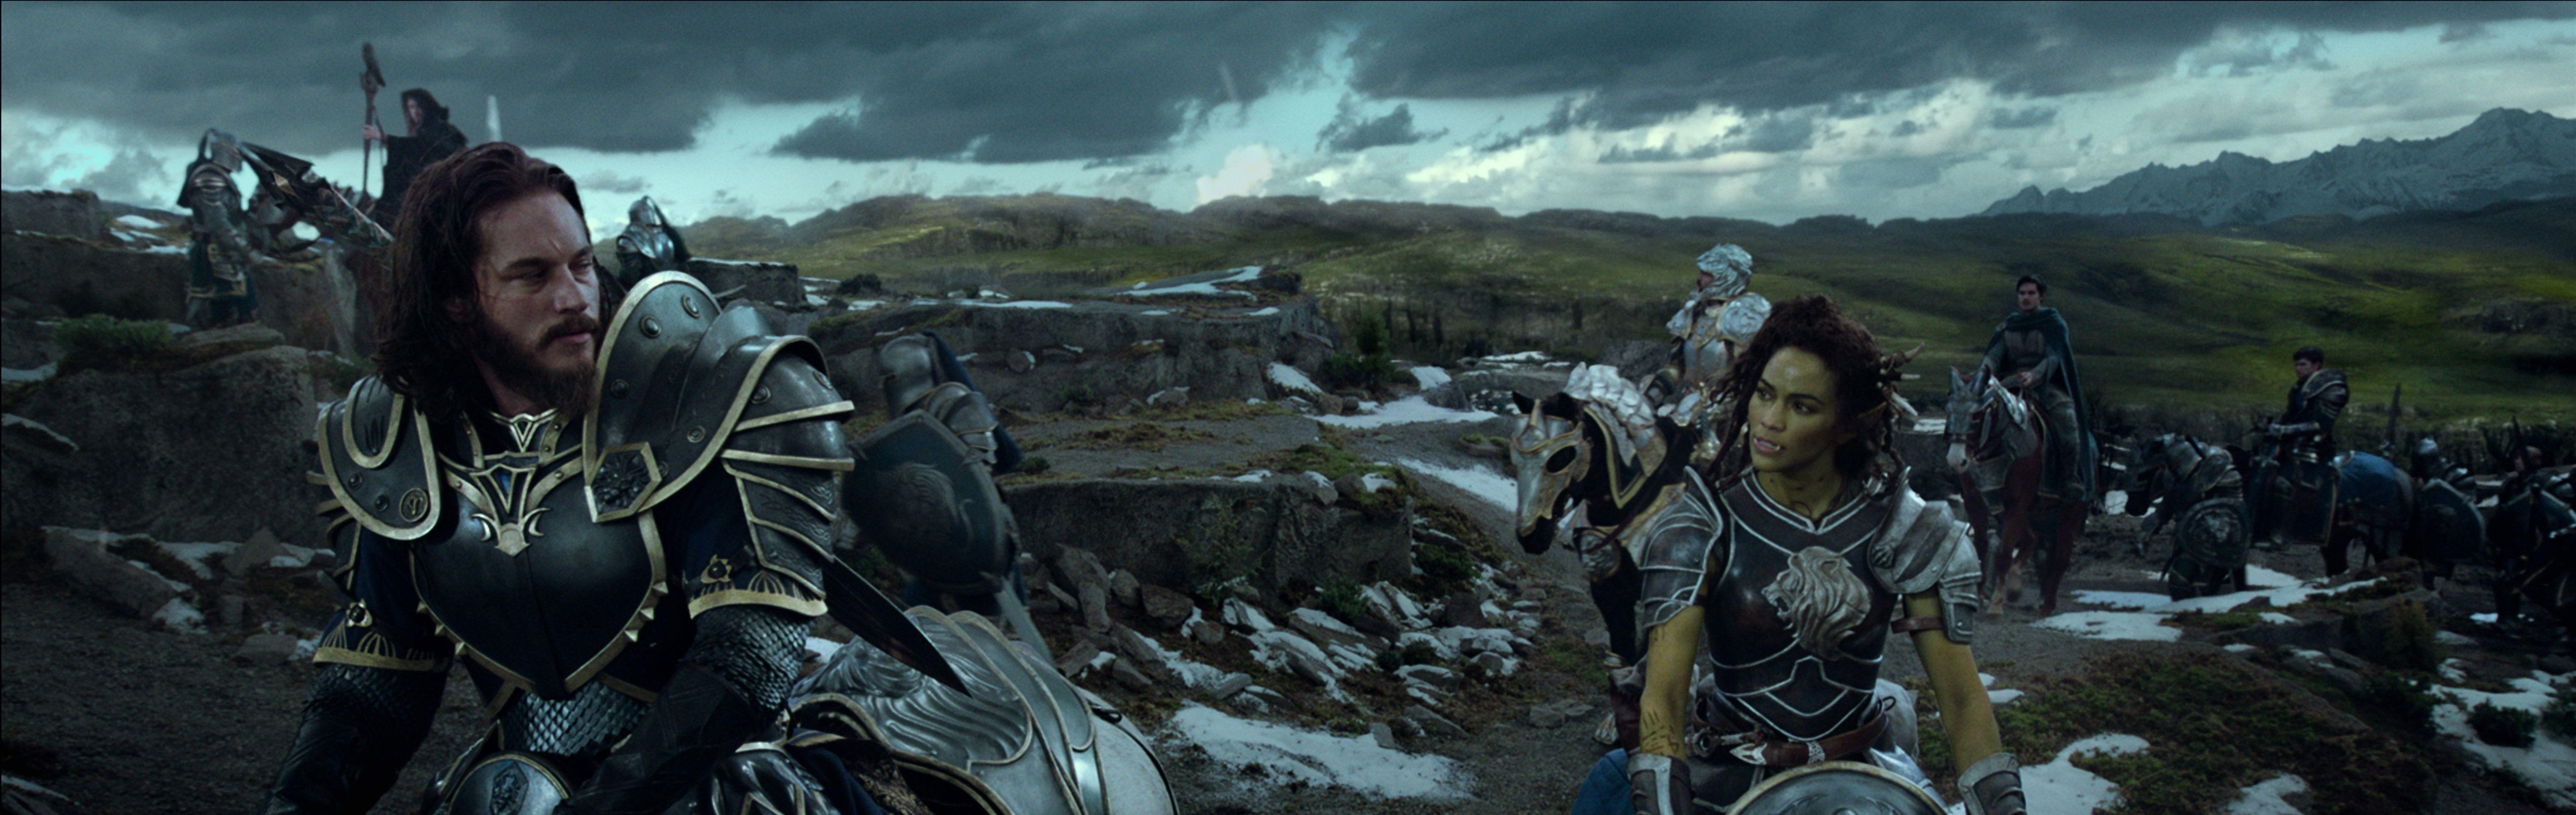 Warcraft_Panorama.0